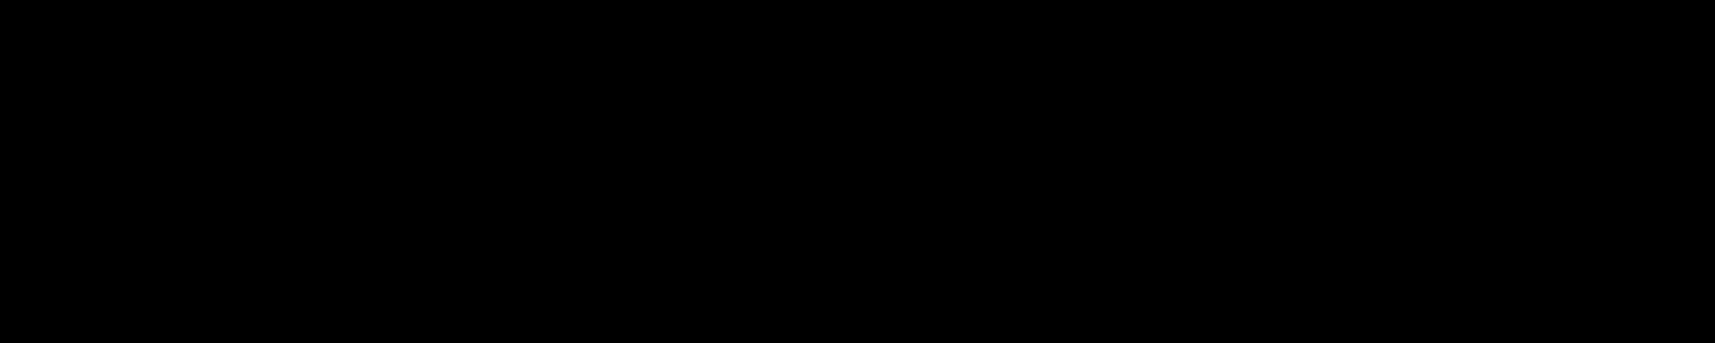 Celestial Clan symbols